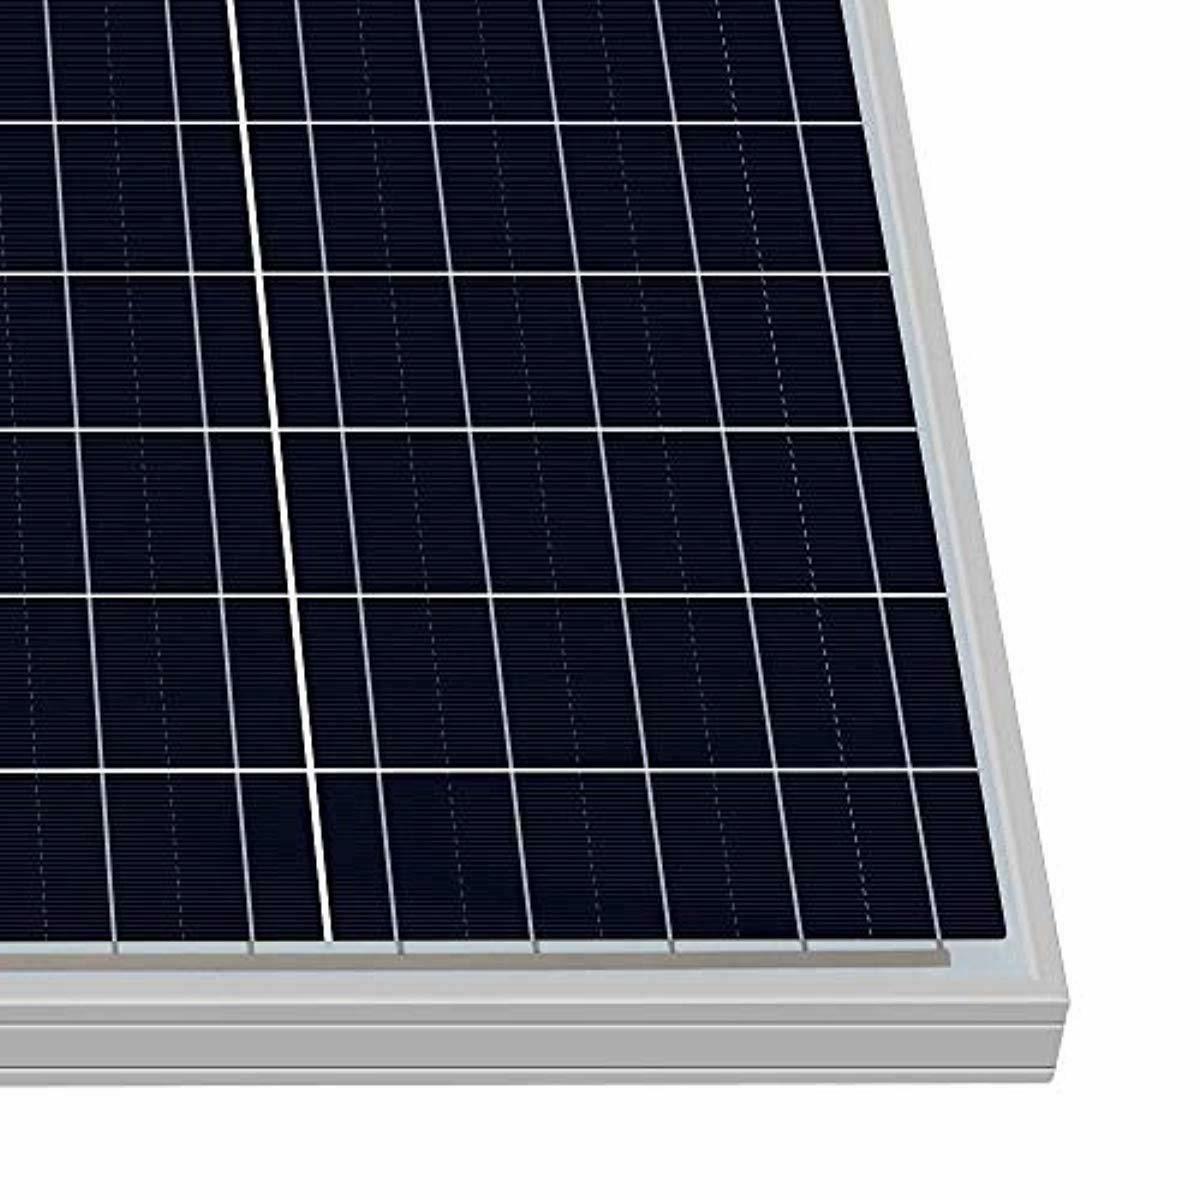 HQST 50W 12V Solar Panel 50 12 Volt Off Power RV Camping